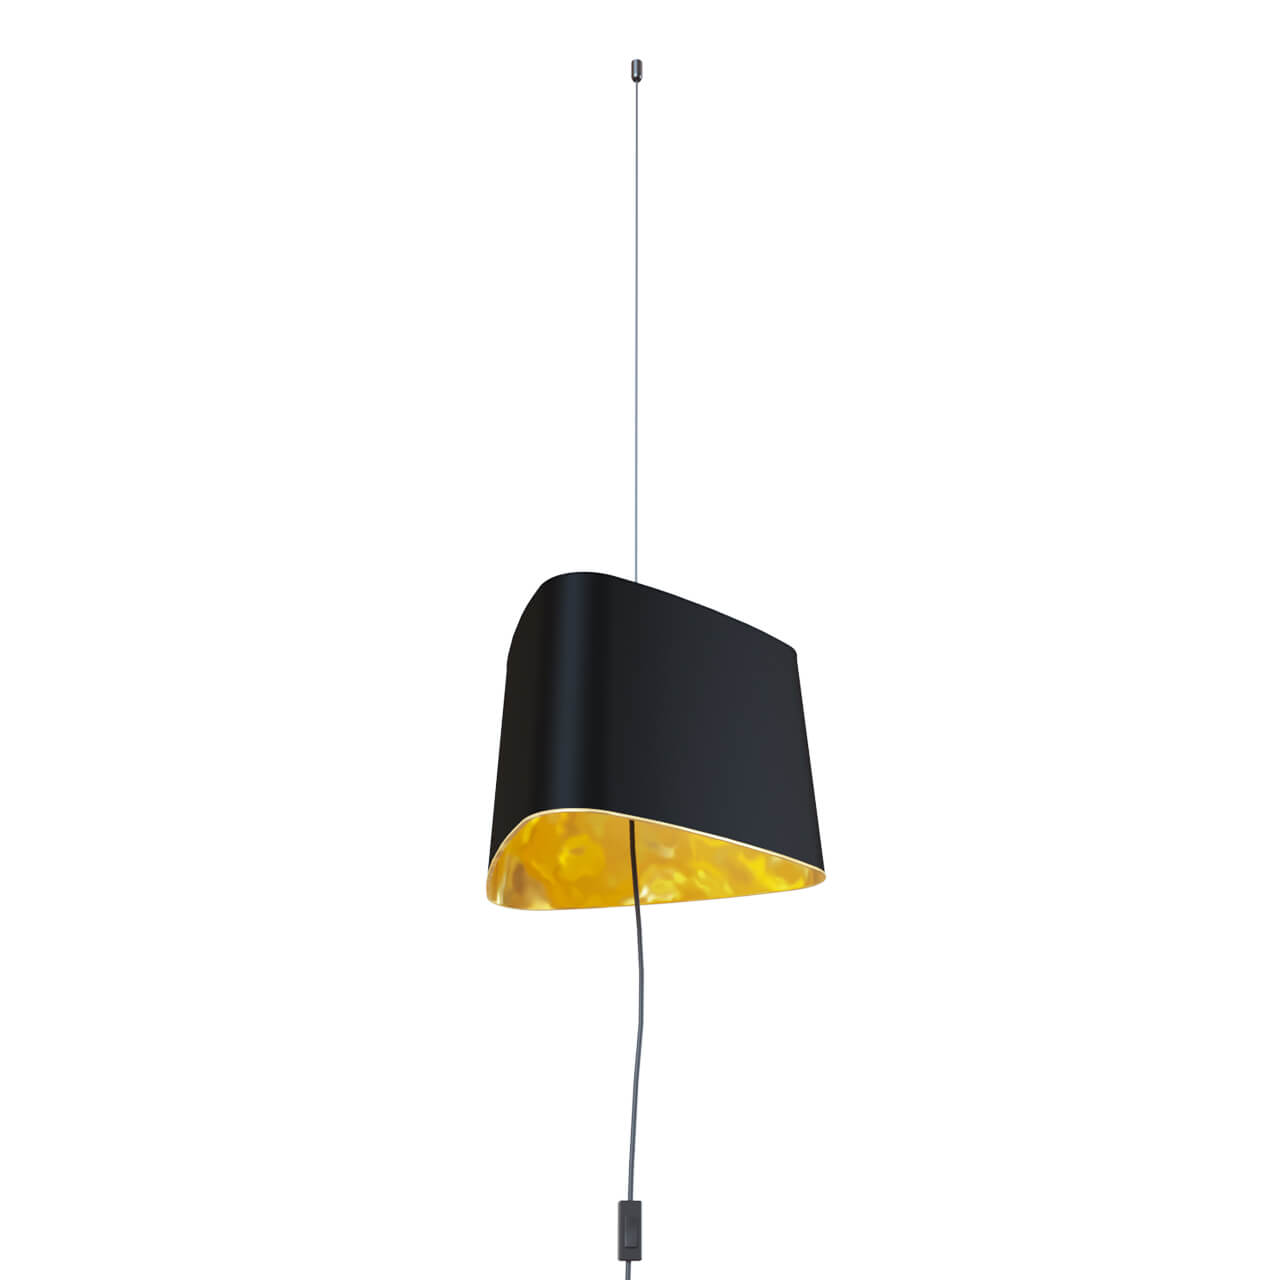 Светильник Loft IT Loft1167F-BL Loft1167 накладной светильник lumin arte spot01 cll5w bl черный